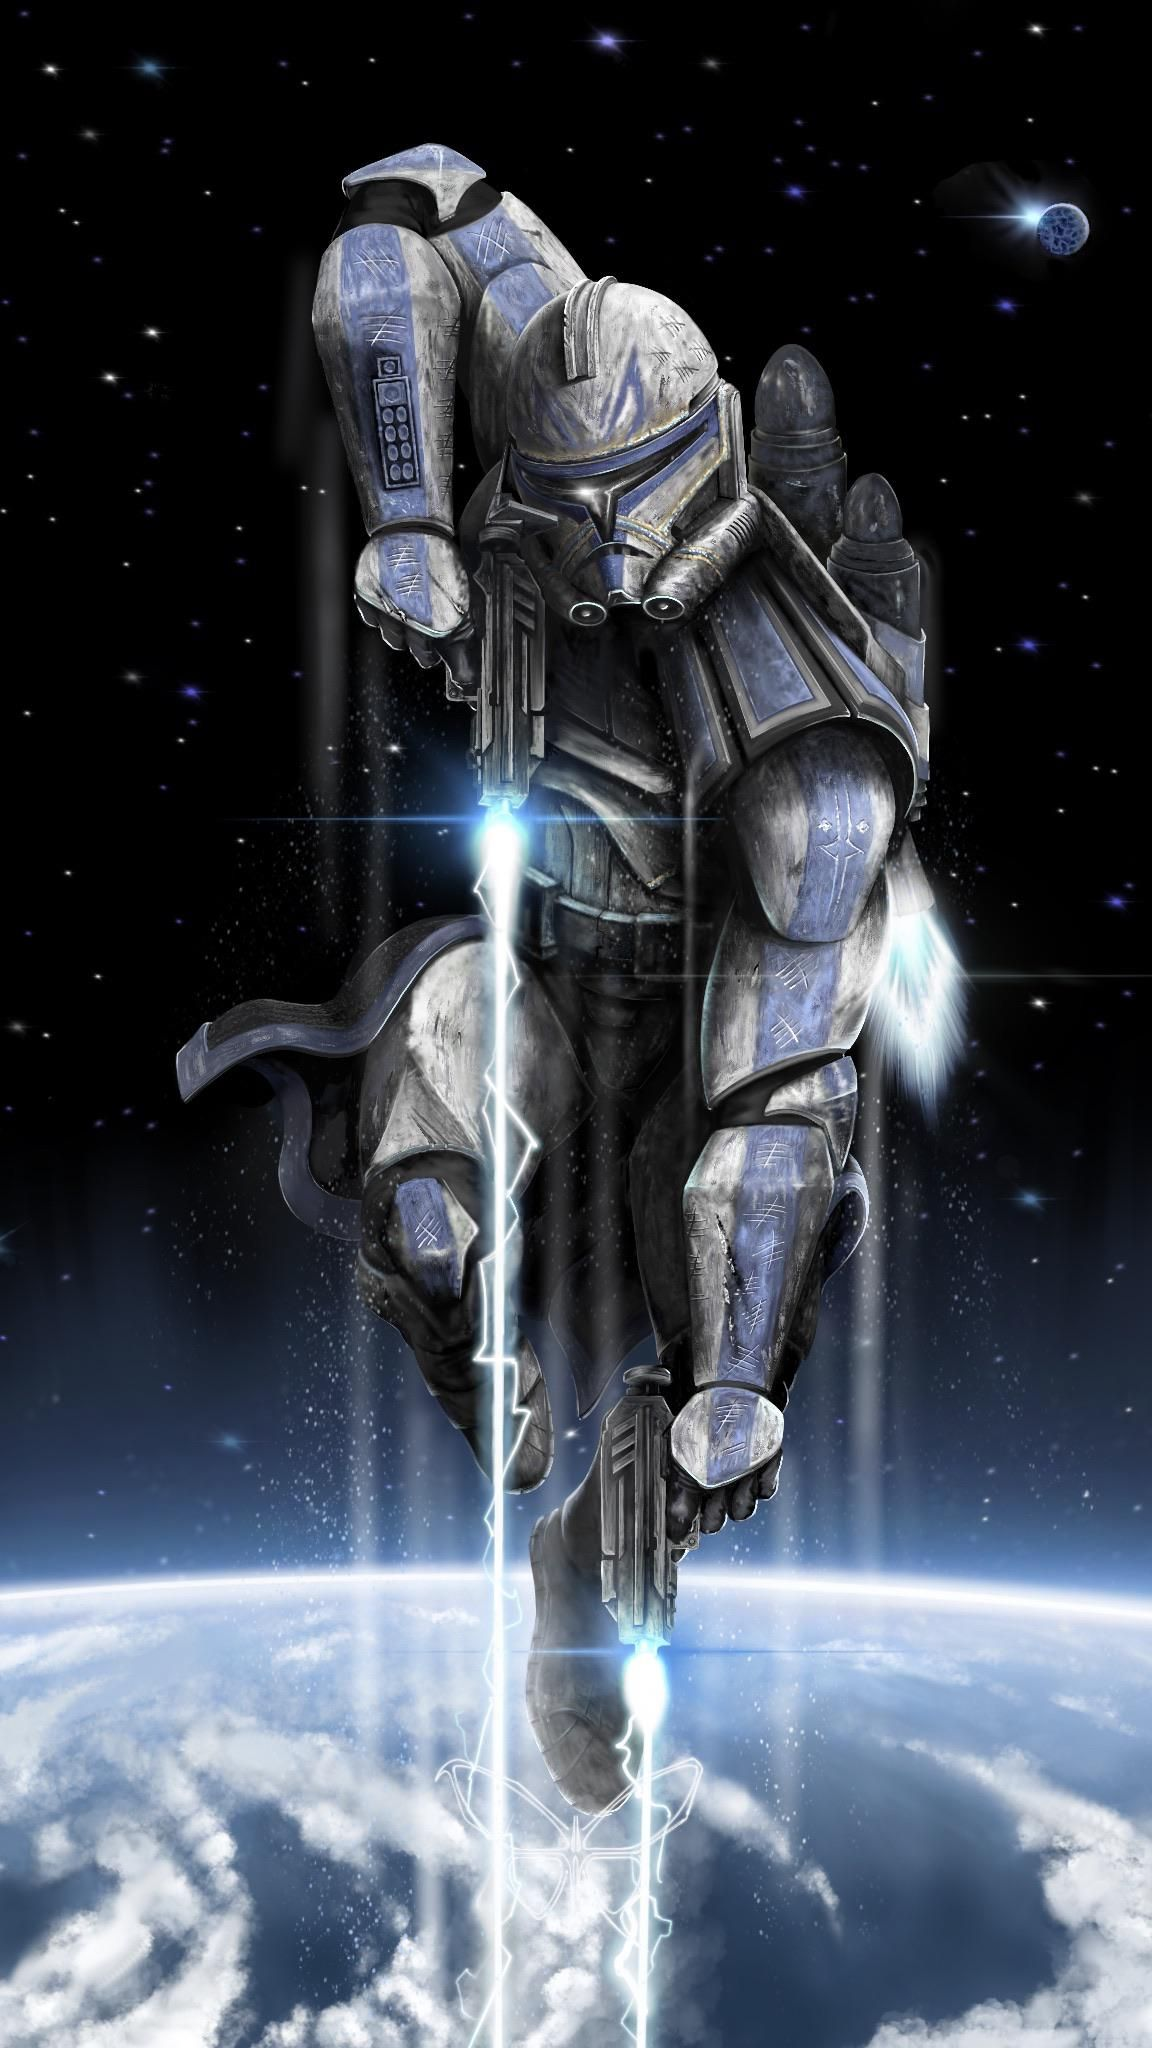 Captain Rex Procreate Me 2020 In 2020 Star Wars Art Star Wars Images Star Wars Wallpaper